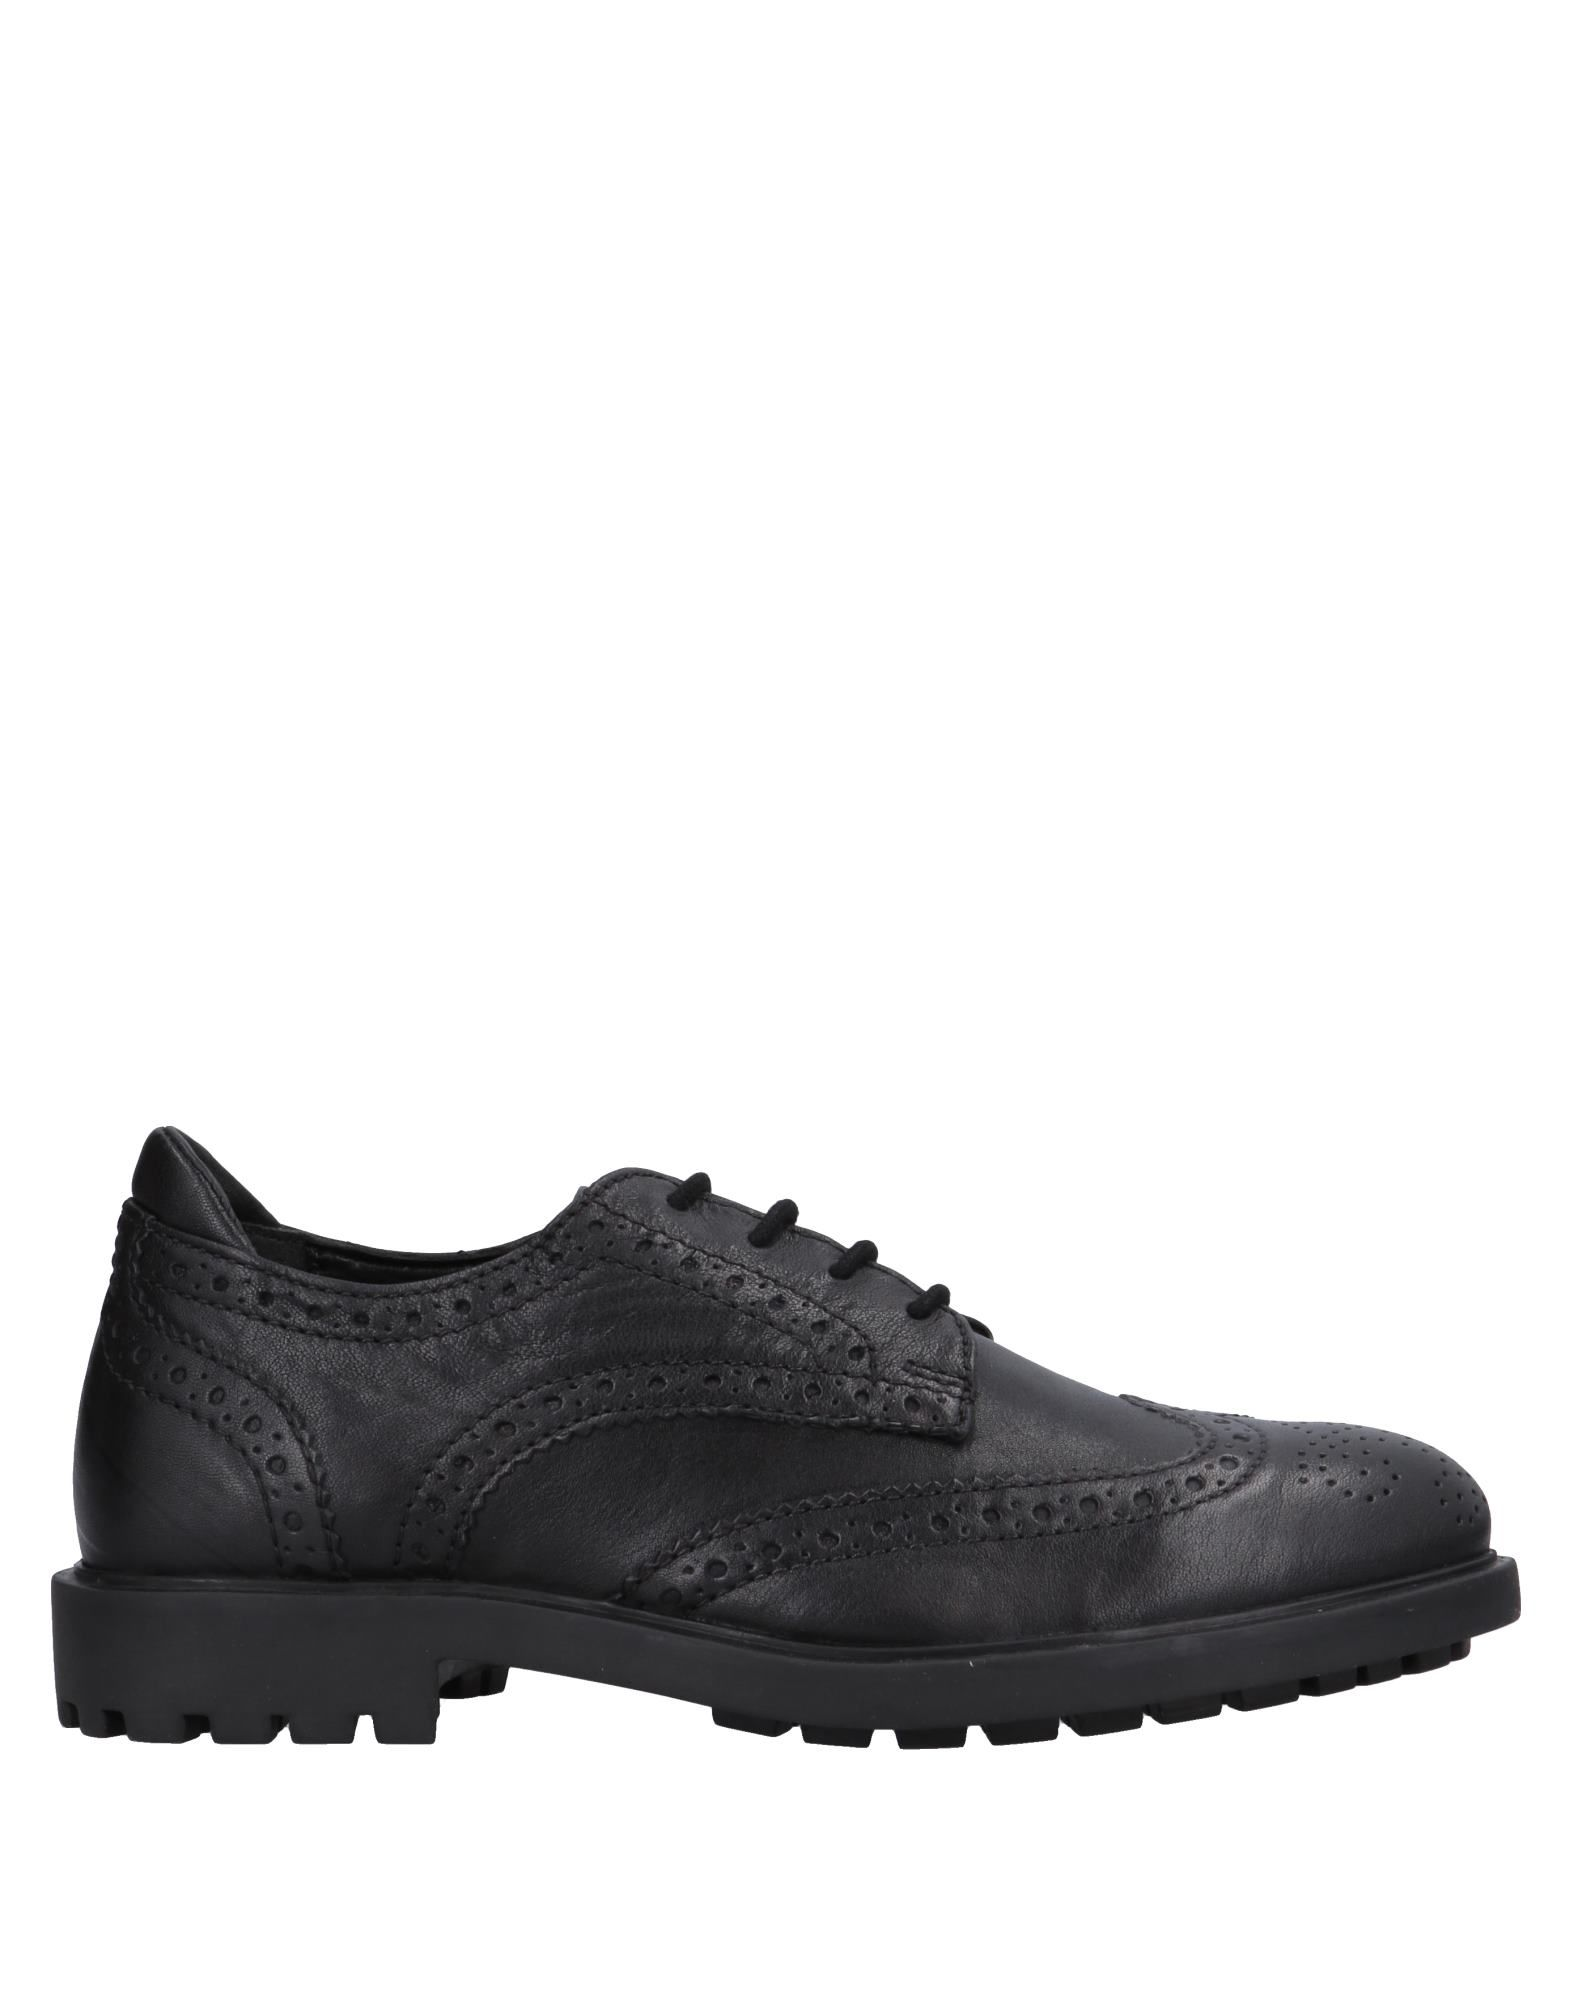 Фото - LUMBERJACK Обувь на шнурках обувь на высокой платформе dkny